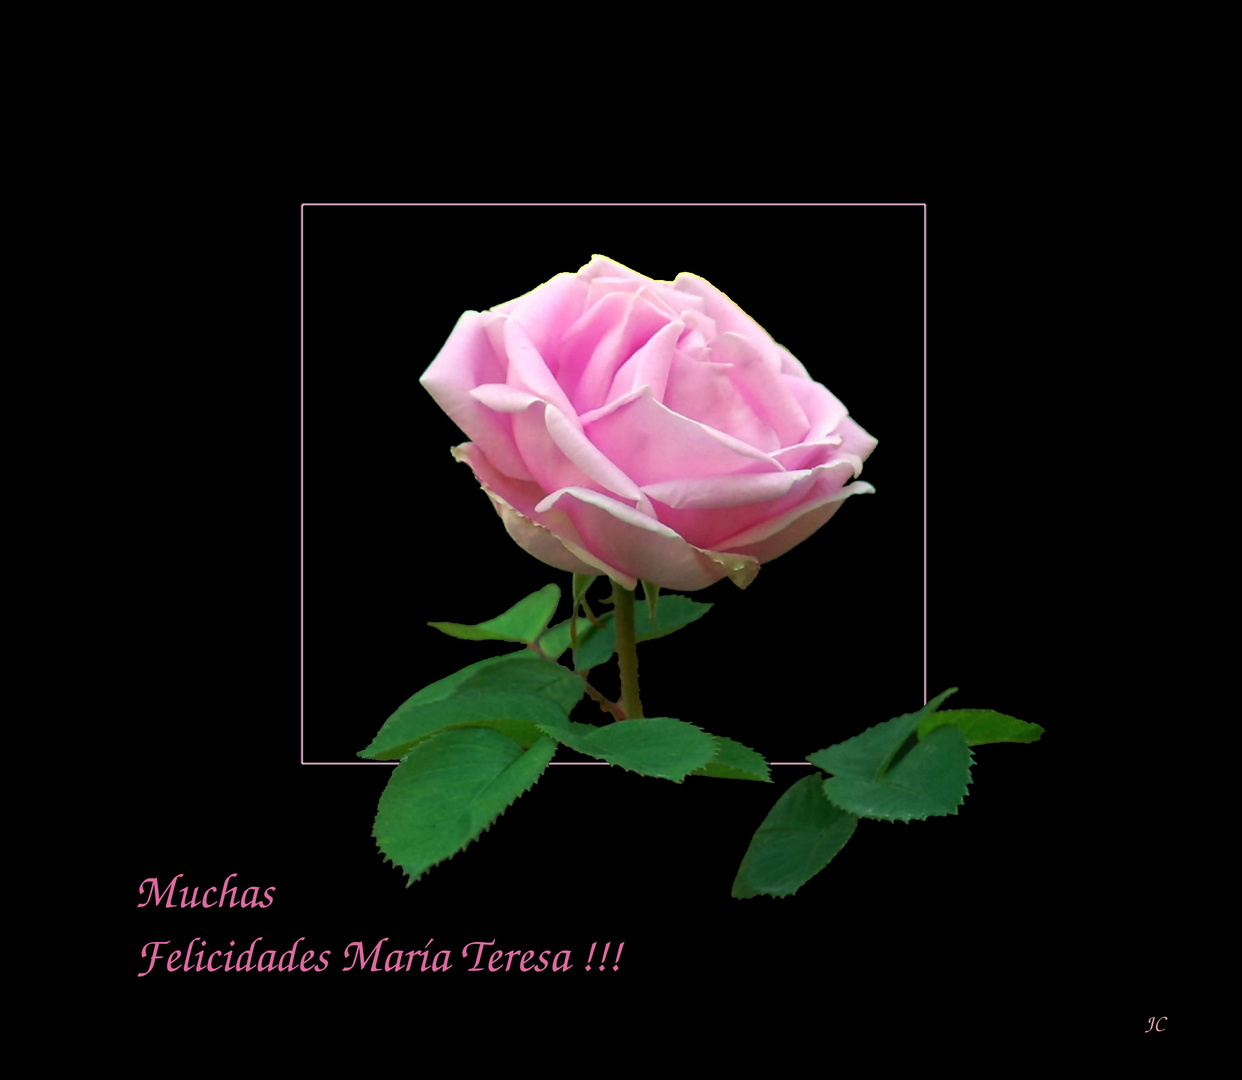 Para M. Teresa Pascual